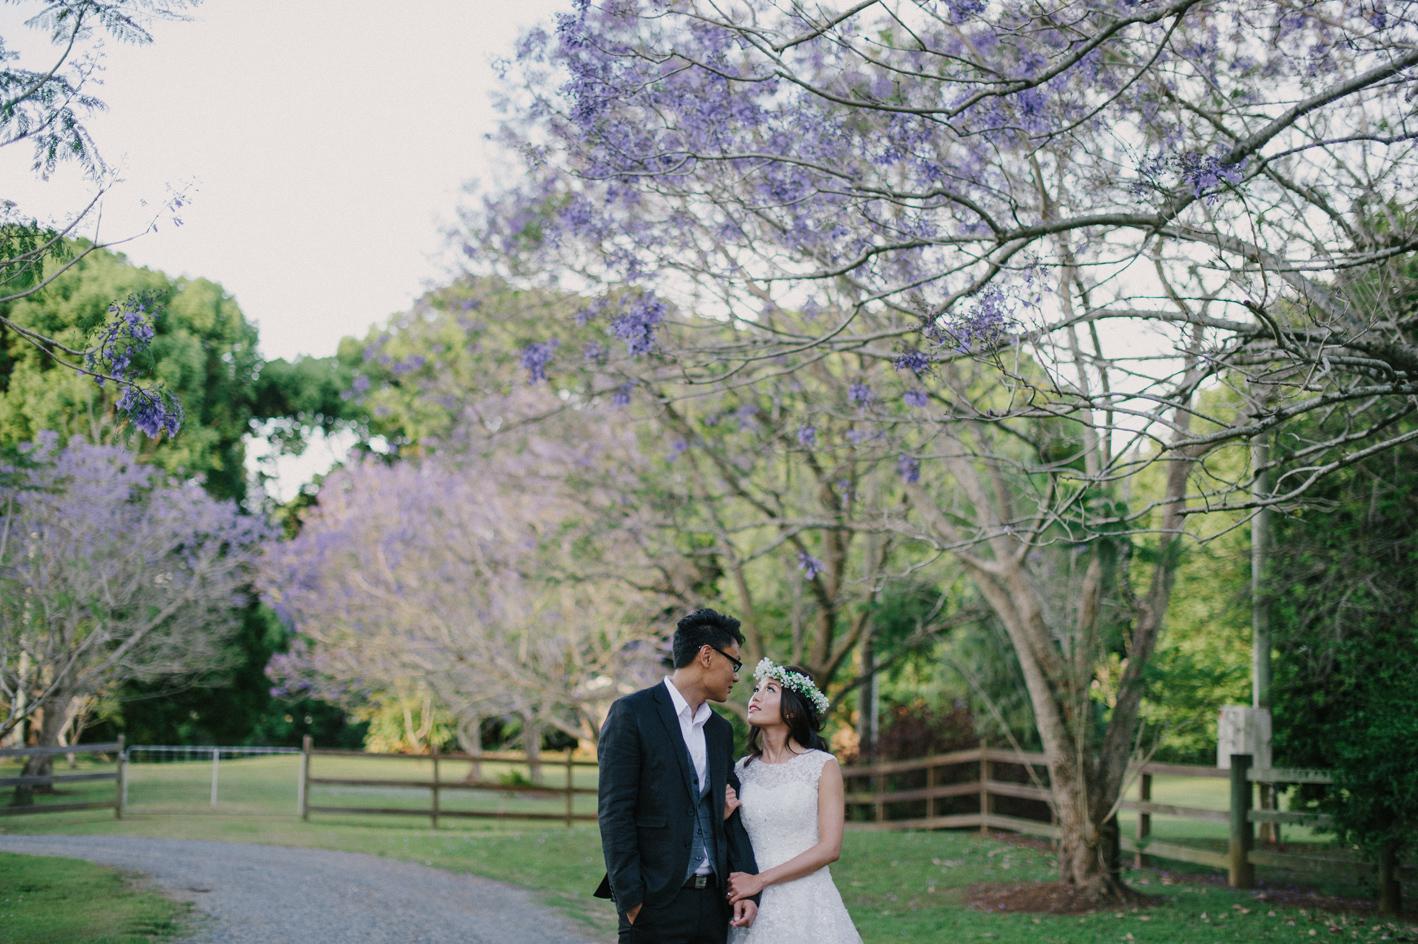 004-ed-janet-currumbin-wedding_sophie-baker-photography